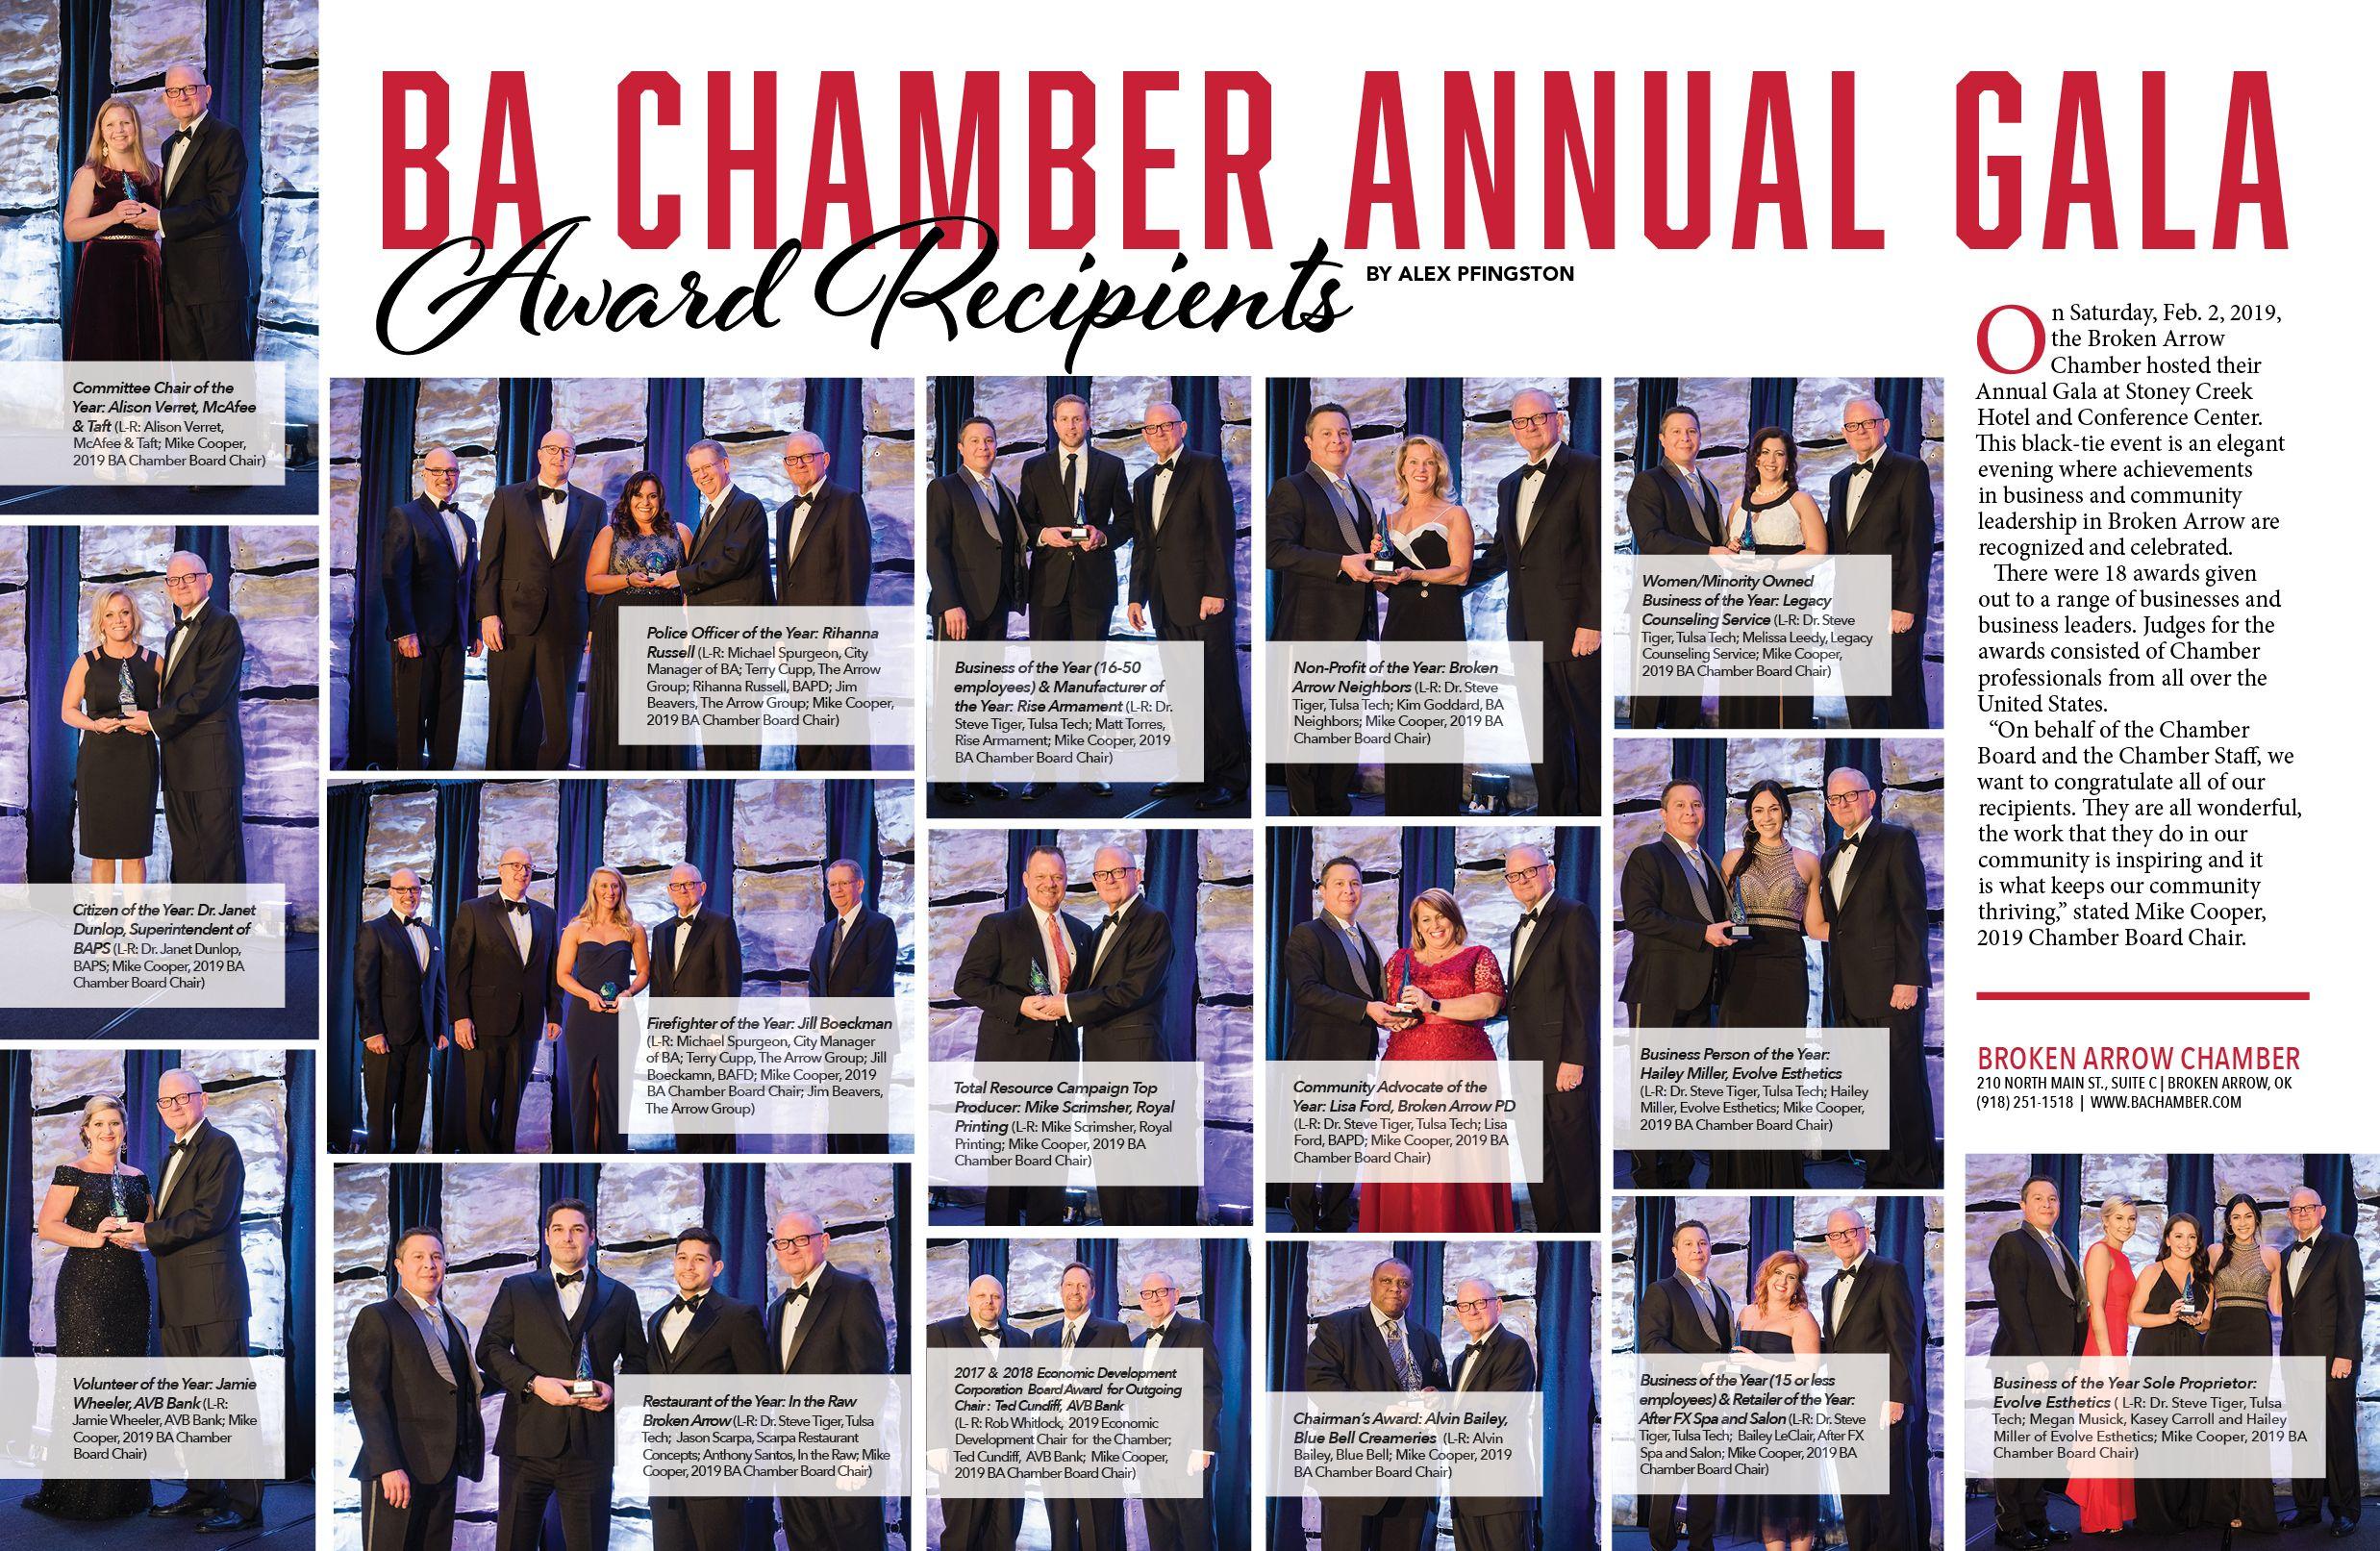 Broken arrow chamber annual gala gala broken arrow annual